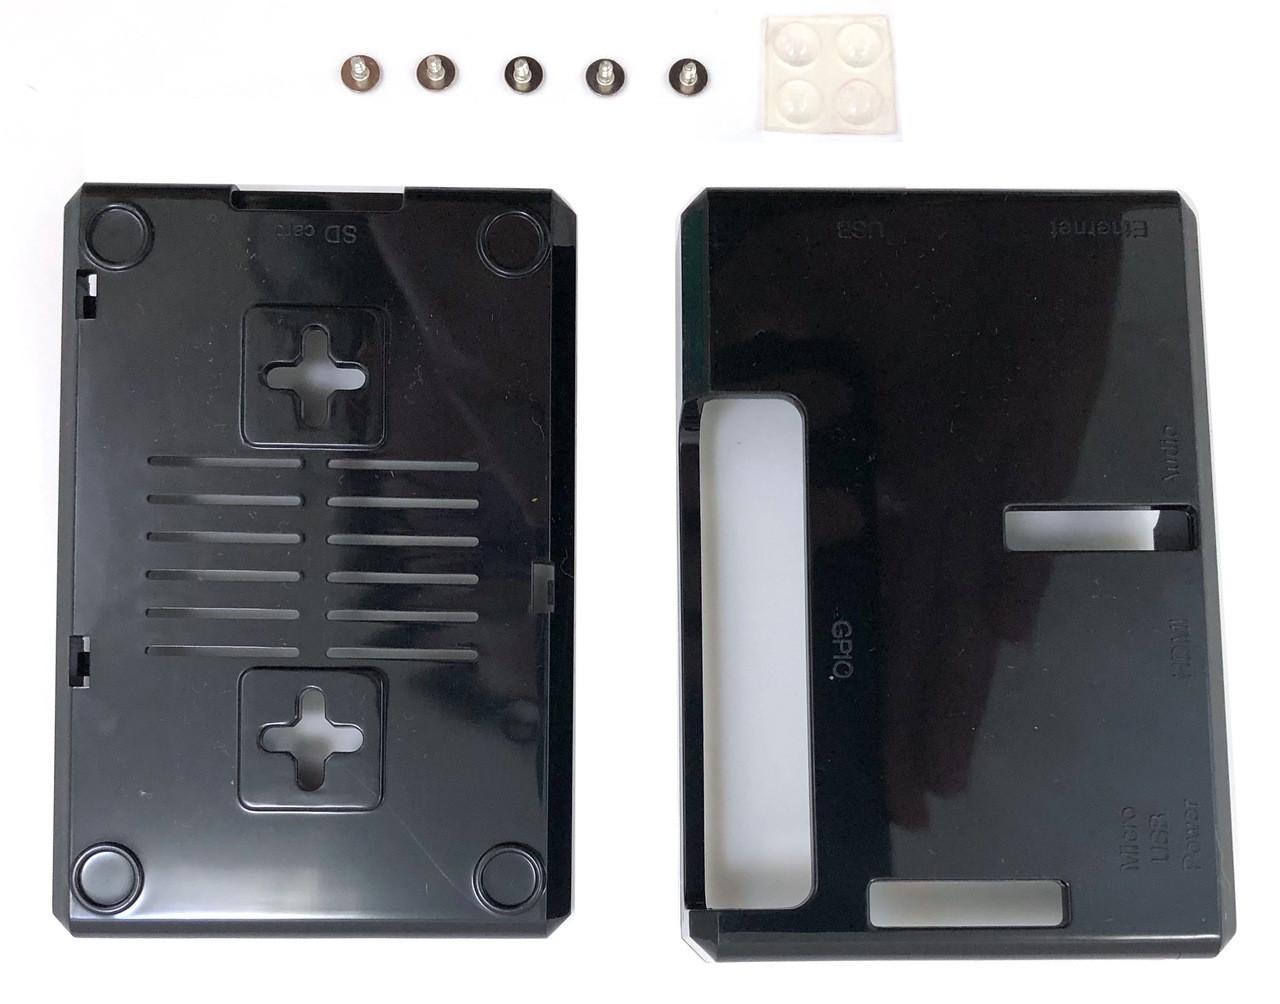 Micro Connectors Plastic Raspberry Pi 3 Model B B+ Case - Black (RAS-PLC01-BK)